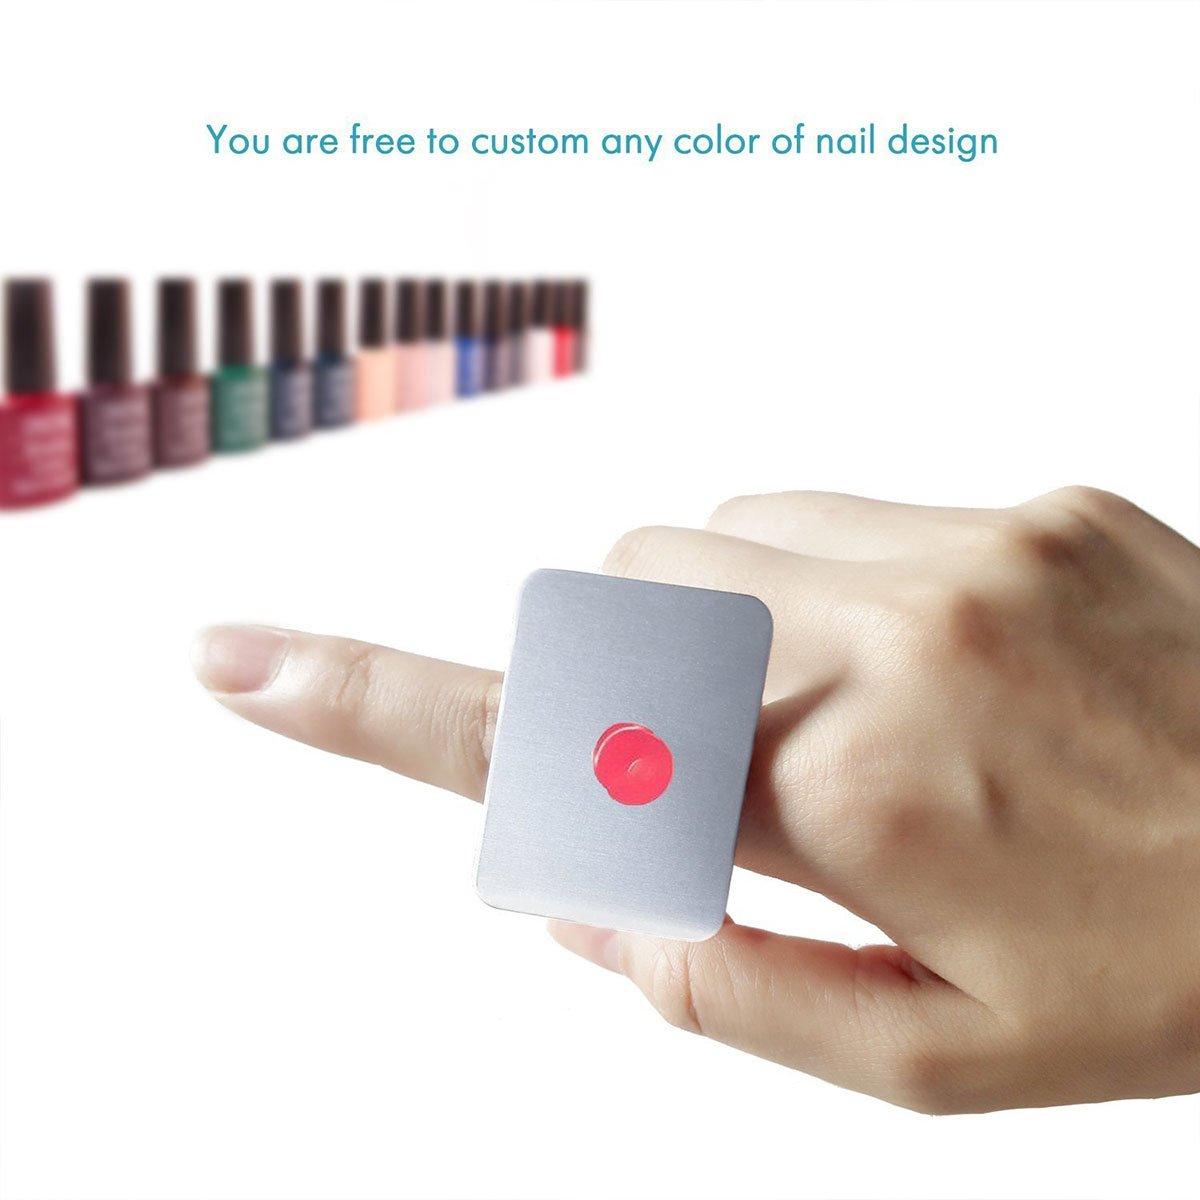 Nail Art Palette Stainless Steel Makeup Mixing Palette Ring Nail DIY Color Mixing Palette Metal Tool 2PCS